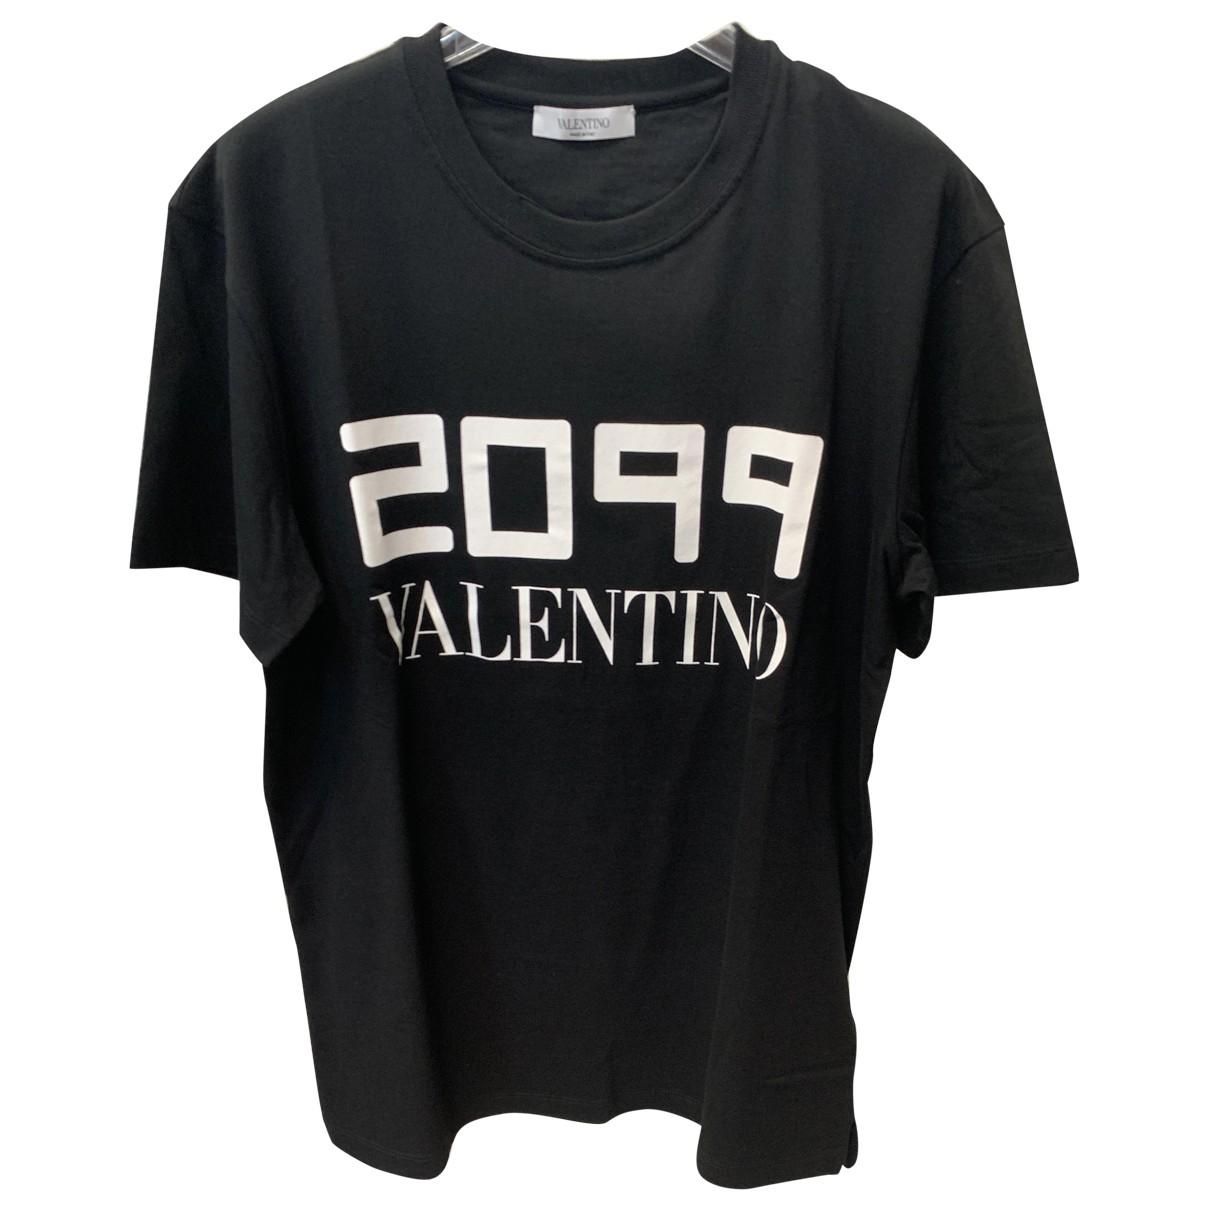 Valentino Garavani \N Black Cotton T-shirts for Men S International